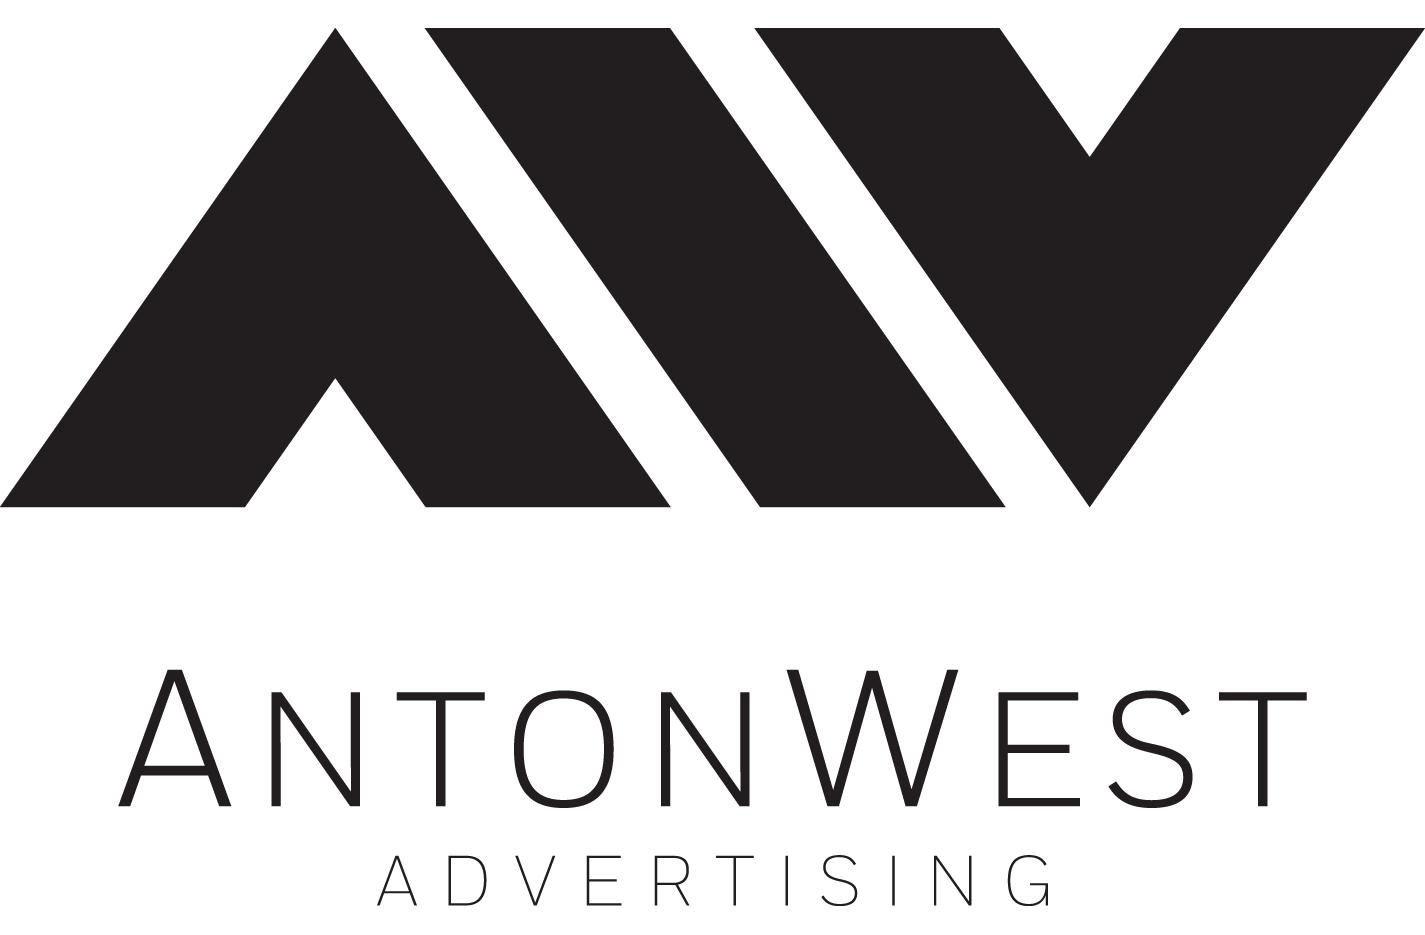 AntonWest